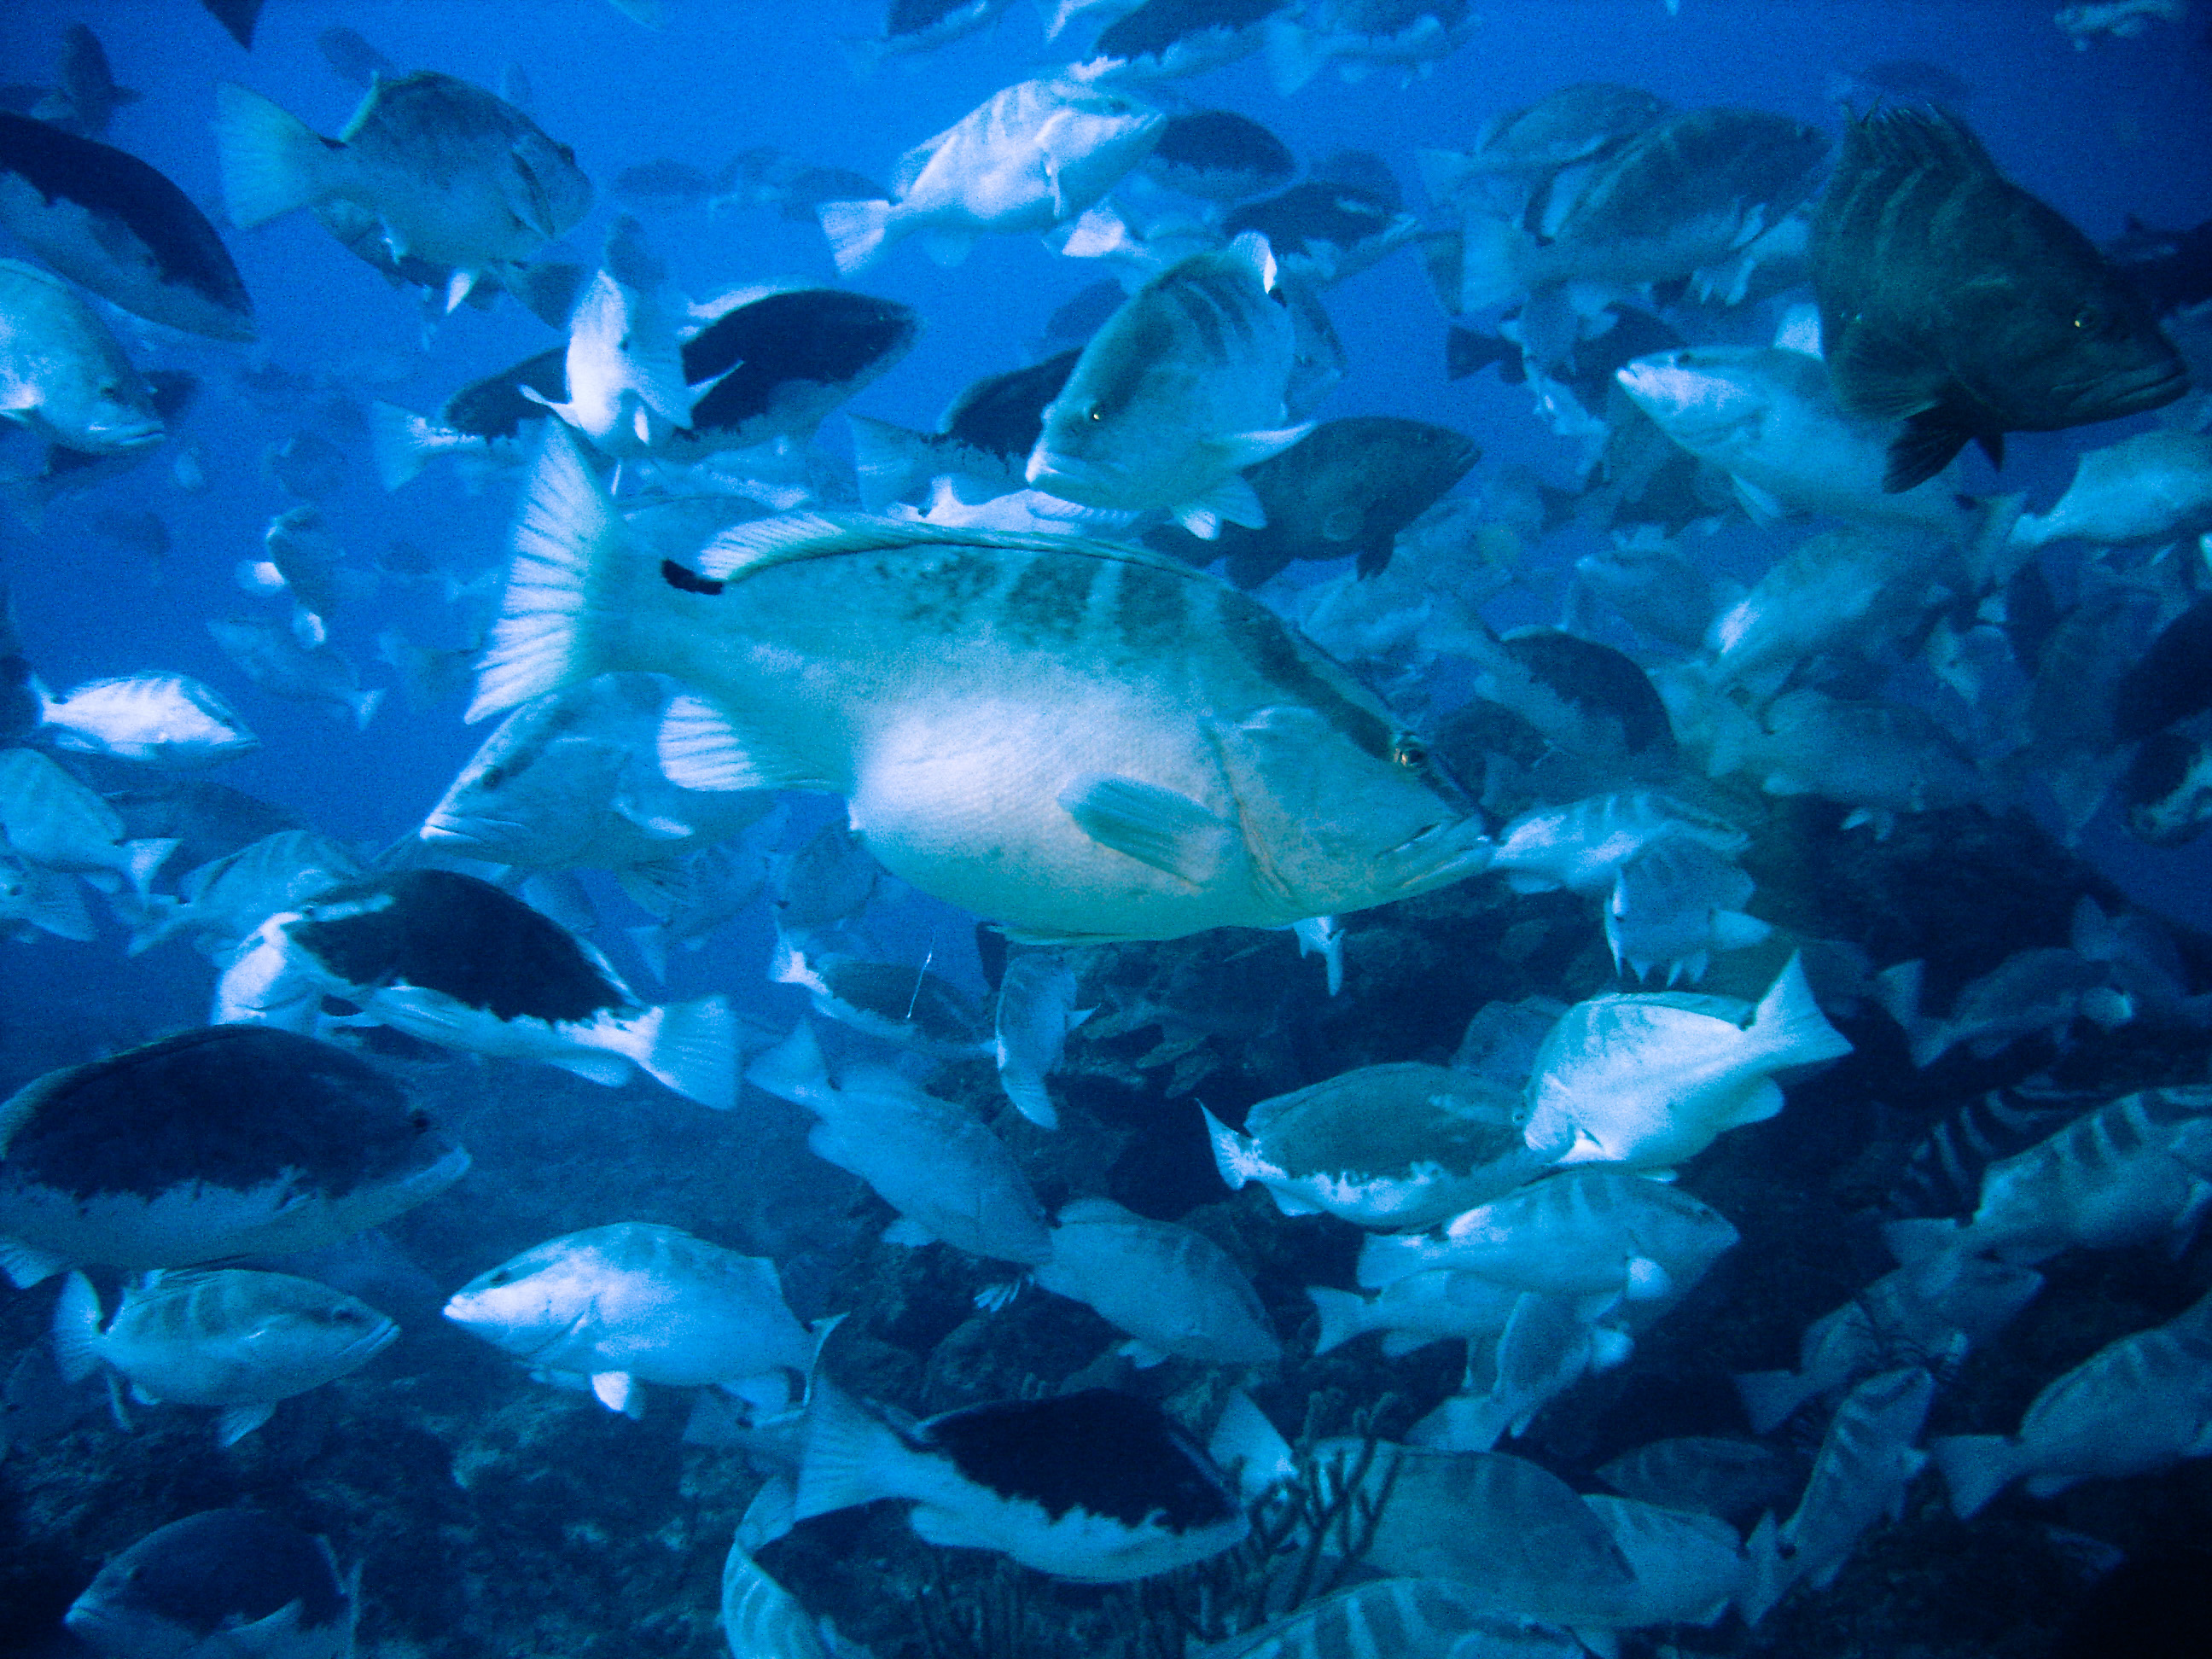 the nassau grouper The habitats, behaviors, and importance of groupers and importance of groupers (epinephelus/mycteroperca) the nassau grouper and the black grouper.